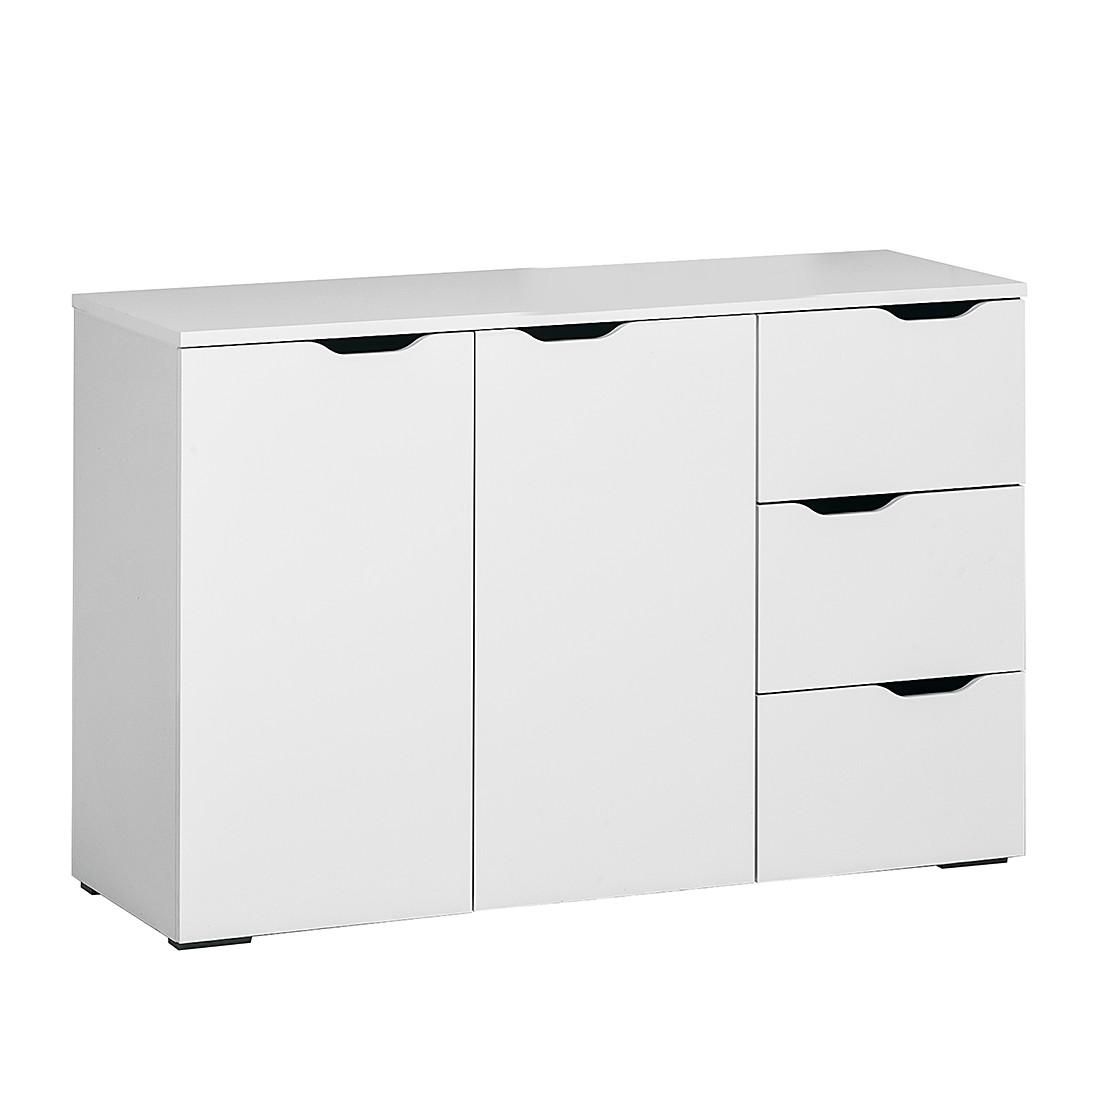 sideboard 60 cm hoch kommode with sideboard 60 cm hoch top stunning sideboard tv kommode im. Black Bedroom Furniture Sets. Home Design Ideas